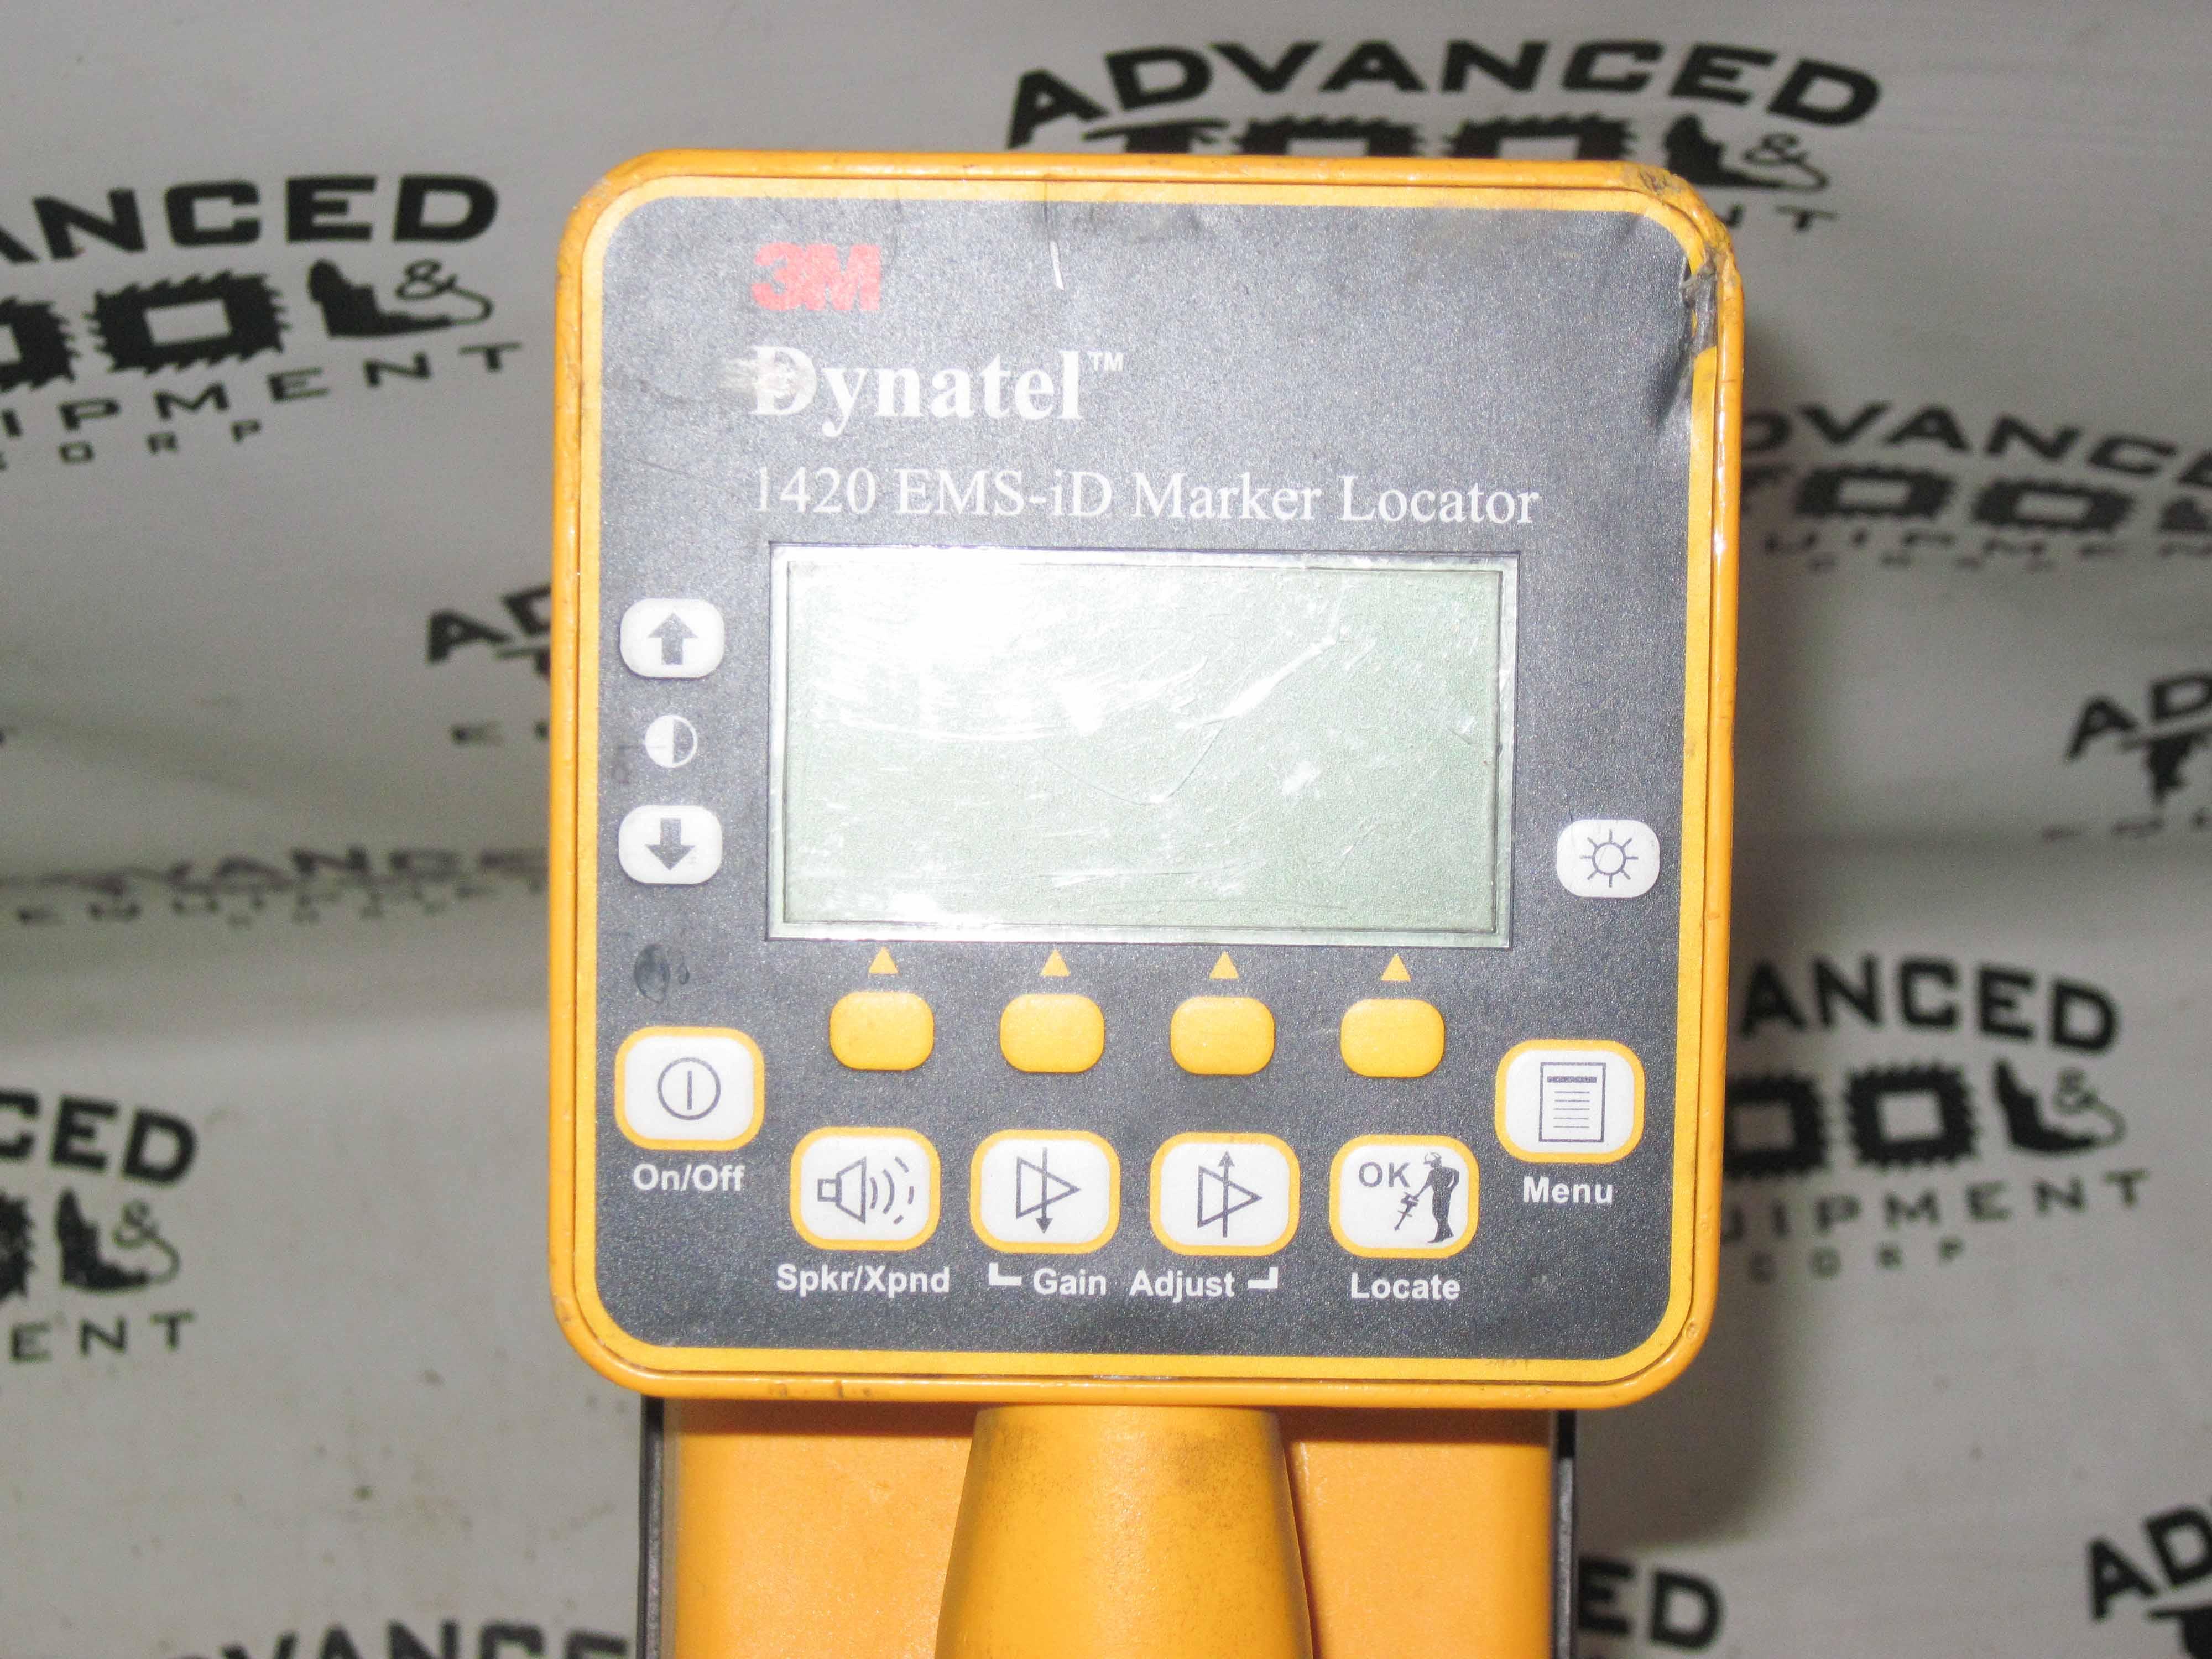 3m dynatel 2273 instructions